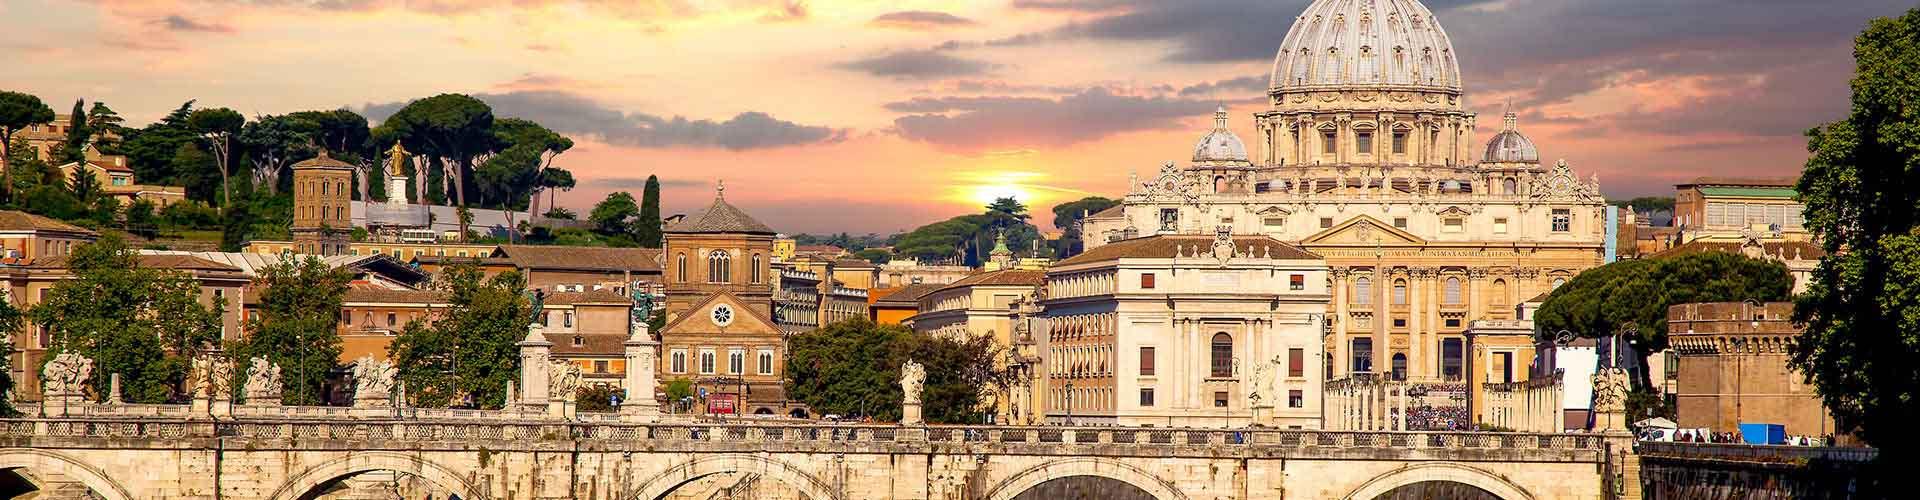 Roma - Albergues en Roma. Mapas de Roma, Fotos y Comentarios para cada Albergue en Roma.